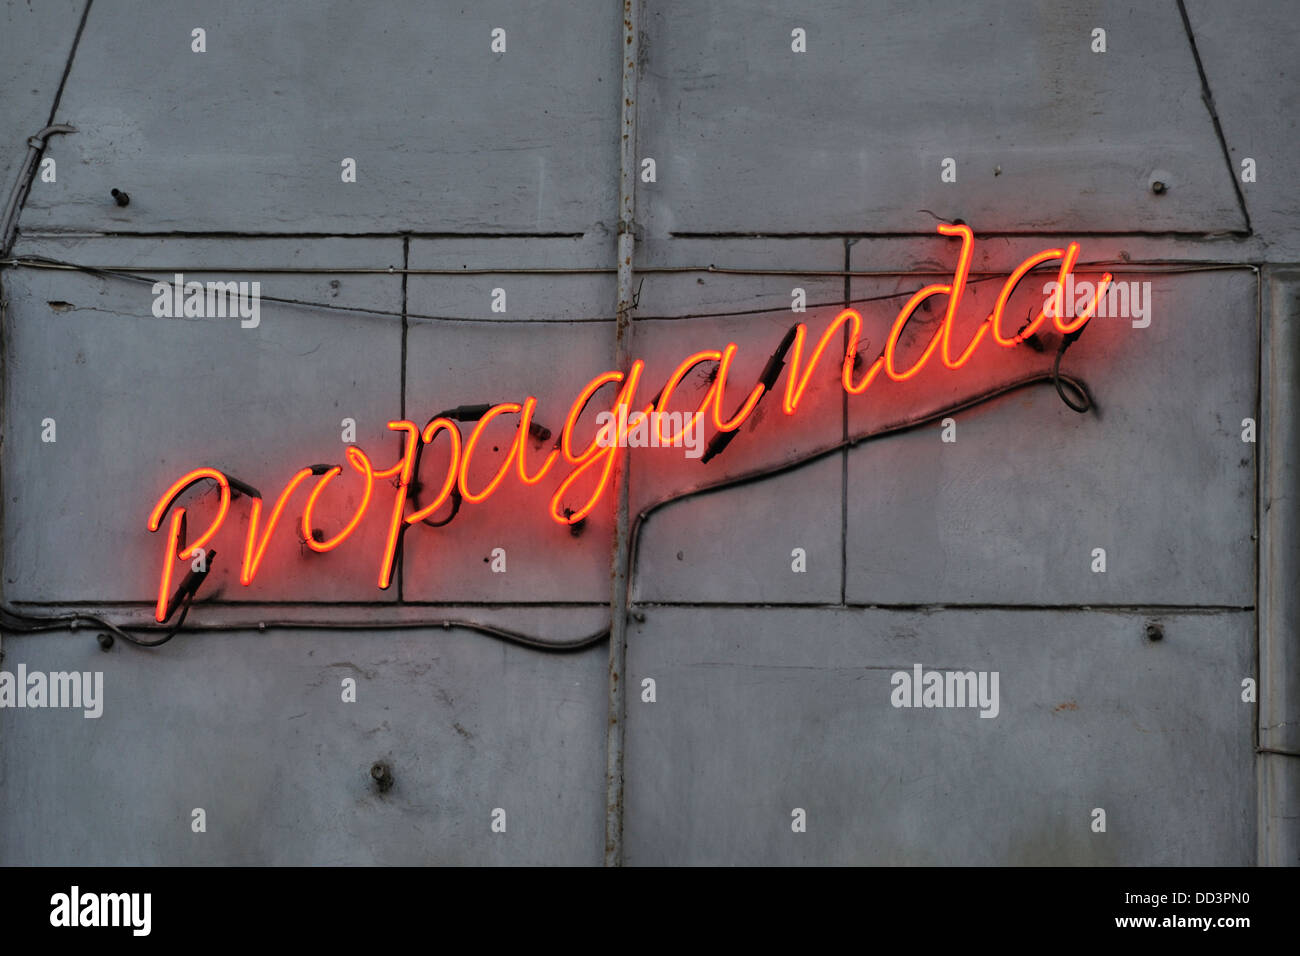 Soviet-style Propaganda bar, Krakow, Poland - Stock Image